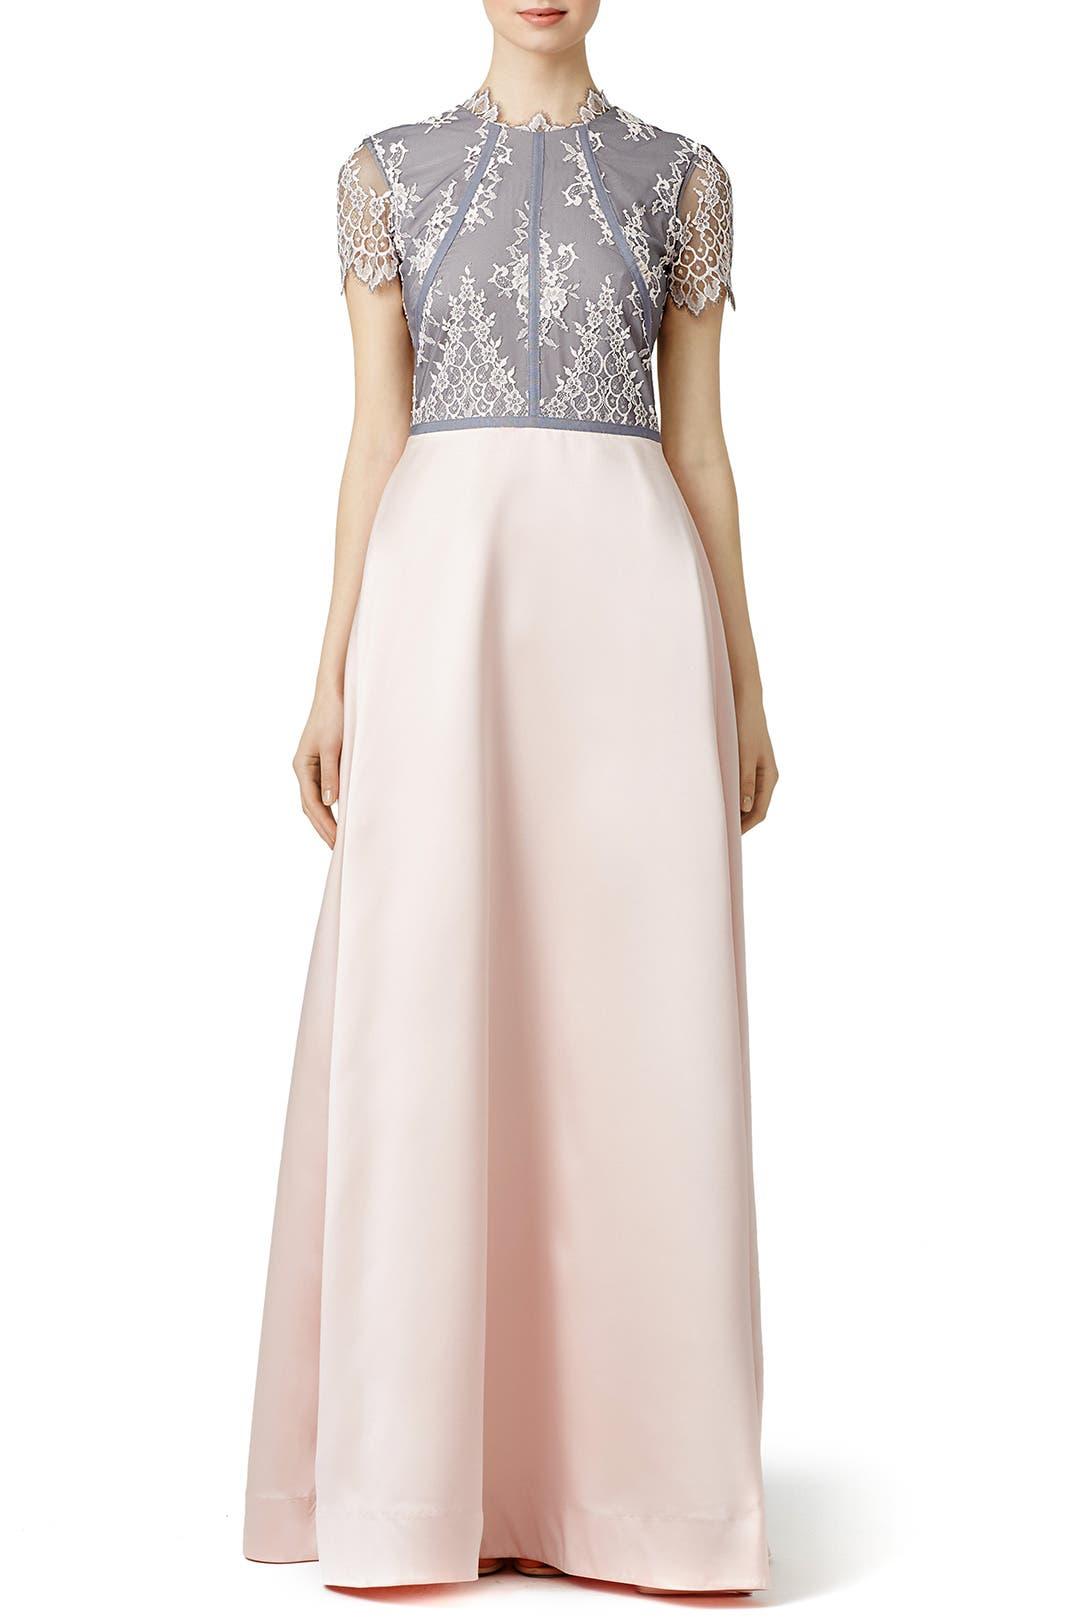 nha khanh Grey Lady Gown